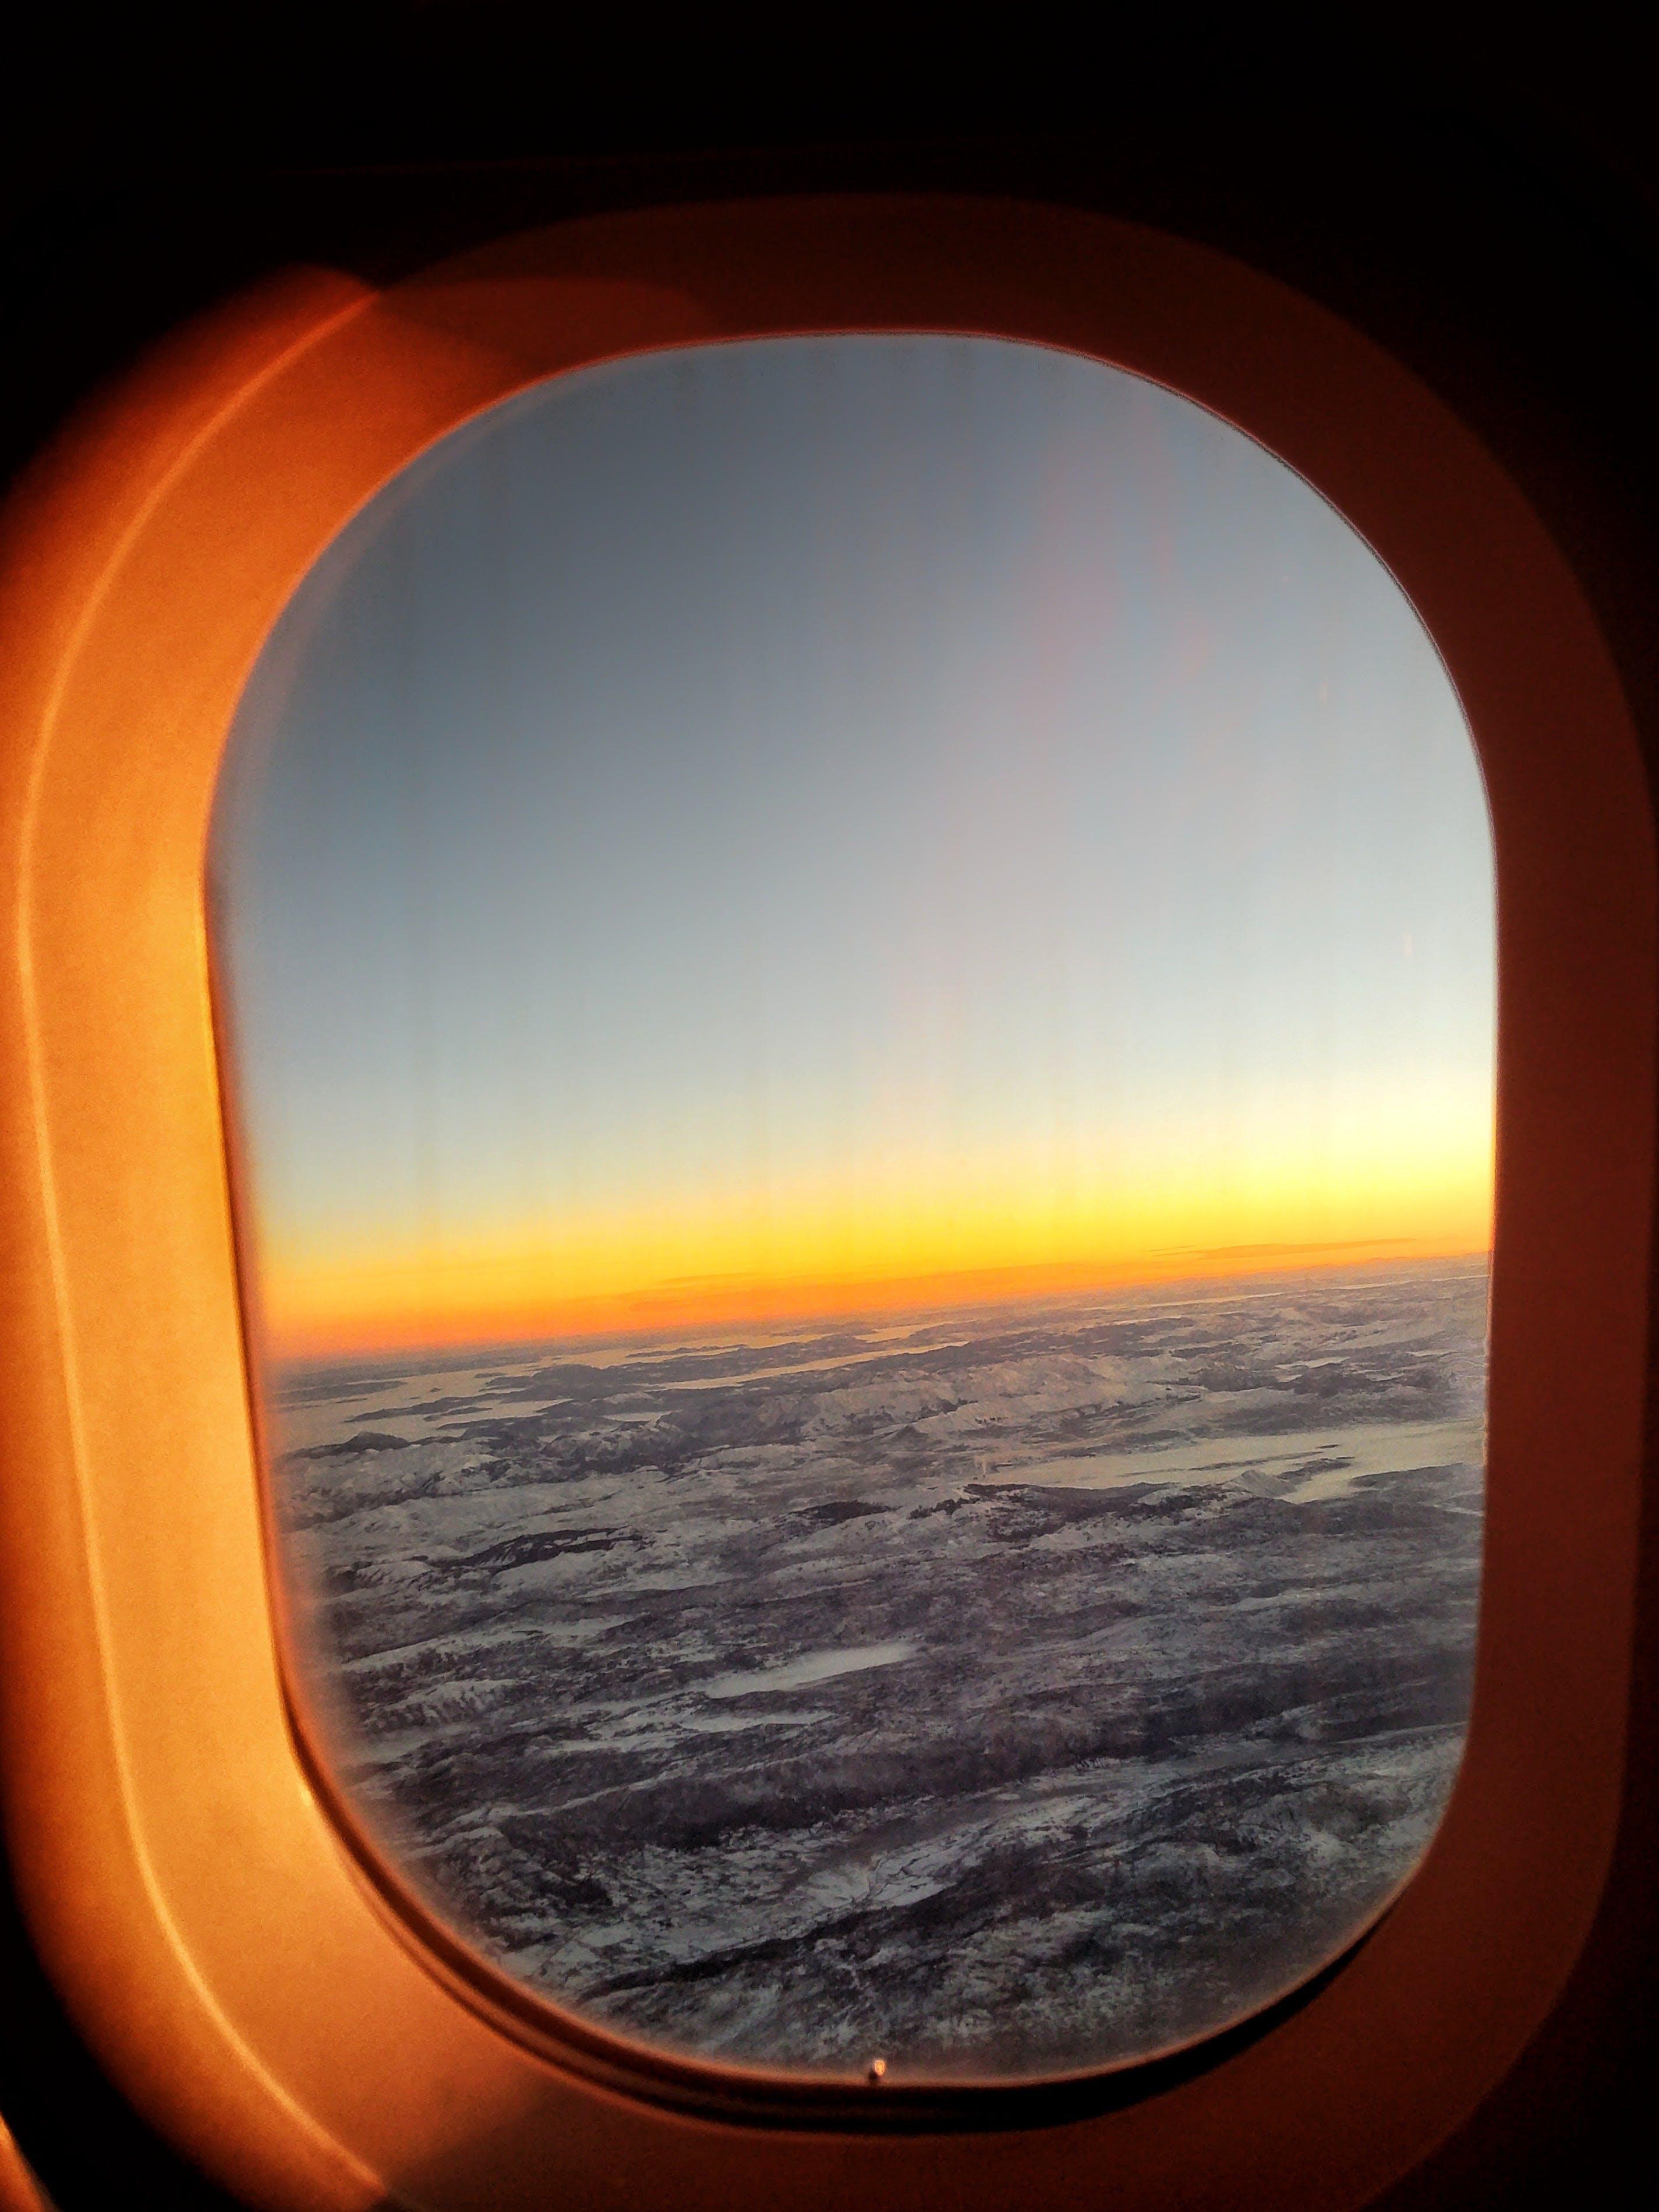 Gratis arkivbilde med daggry, flyging